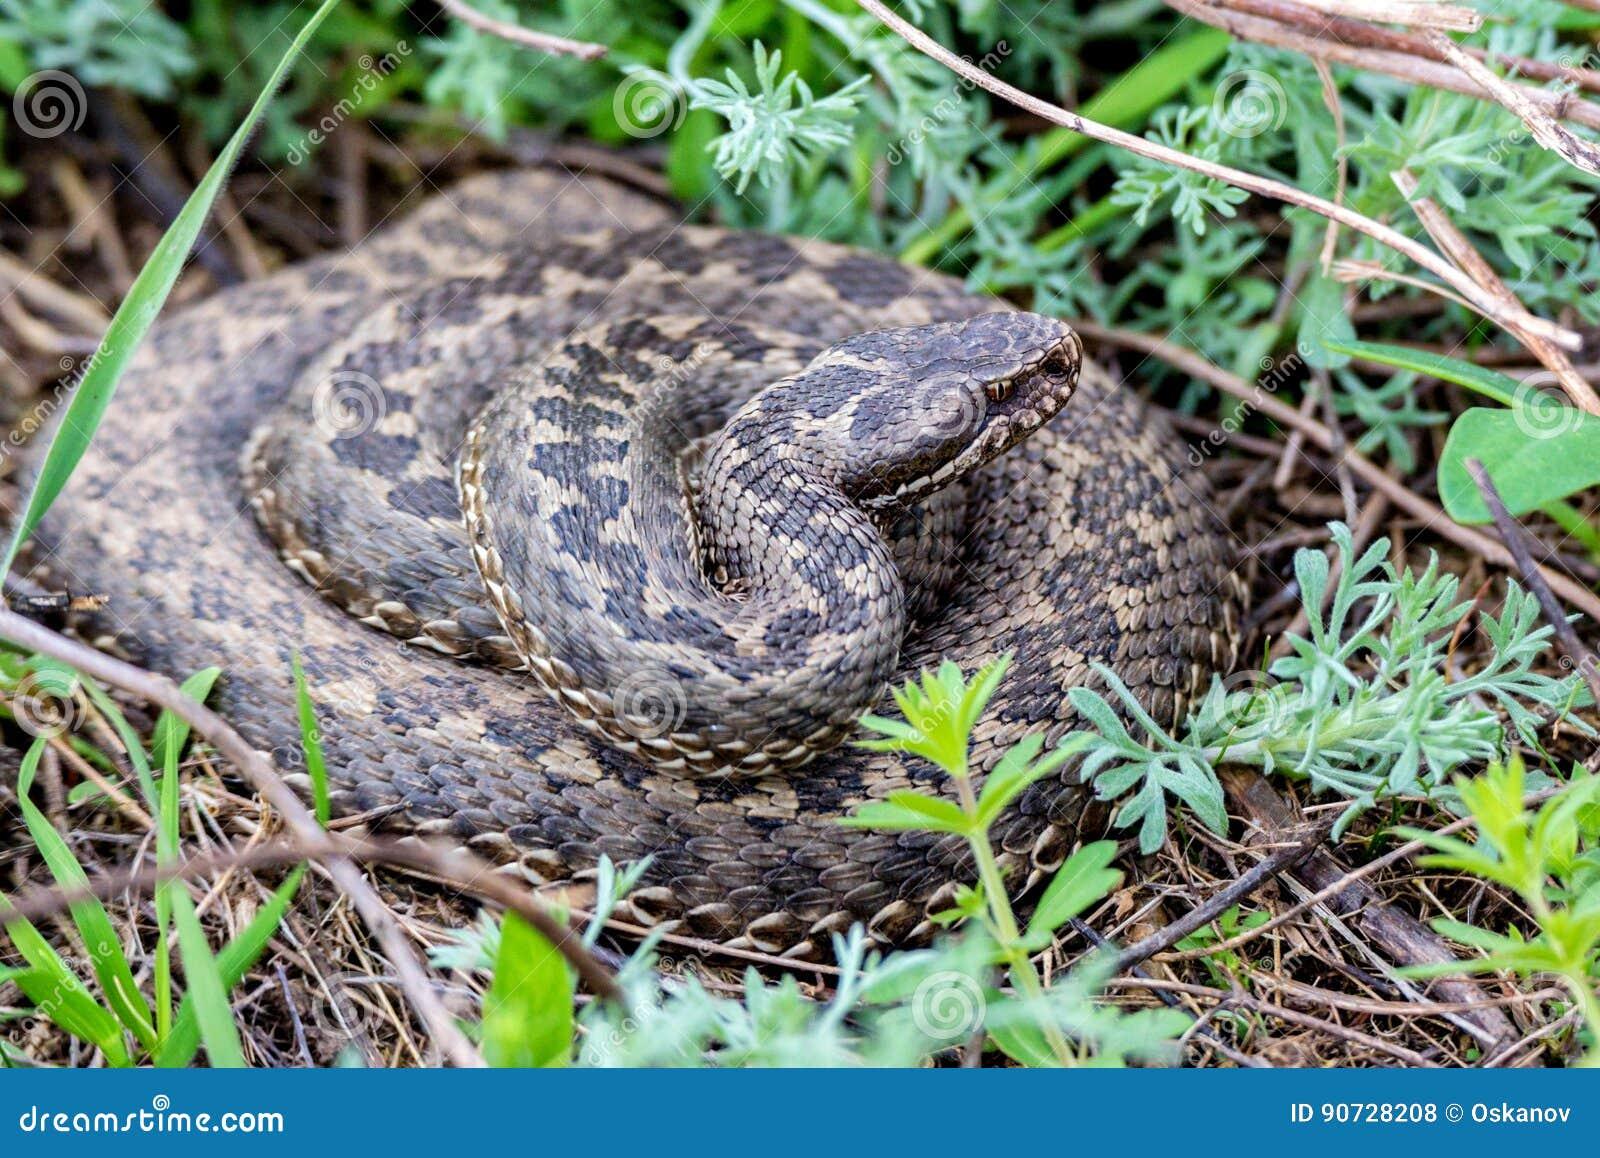 Vipera Ursinii Or Meadow Viper Stock Photo - Image of